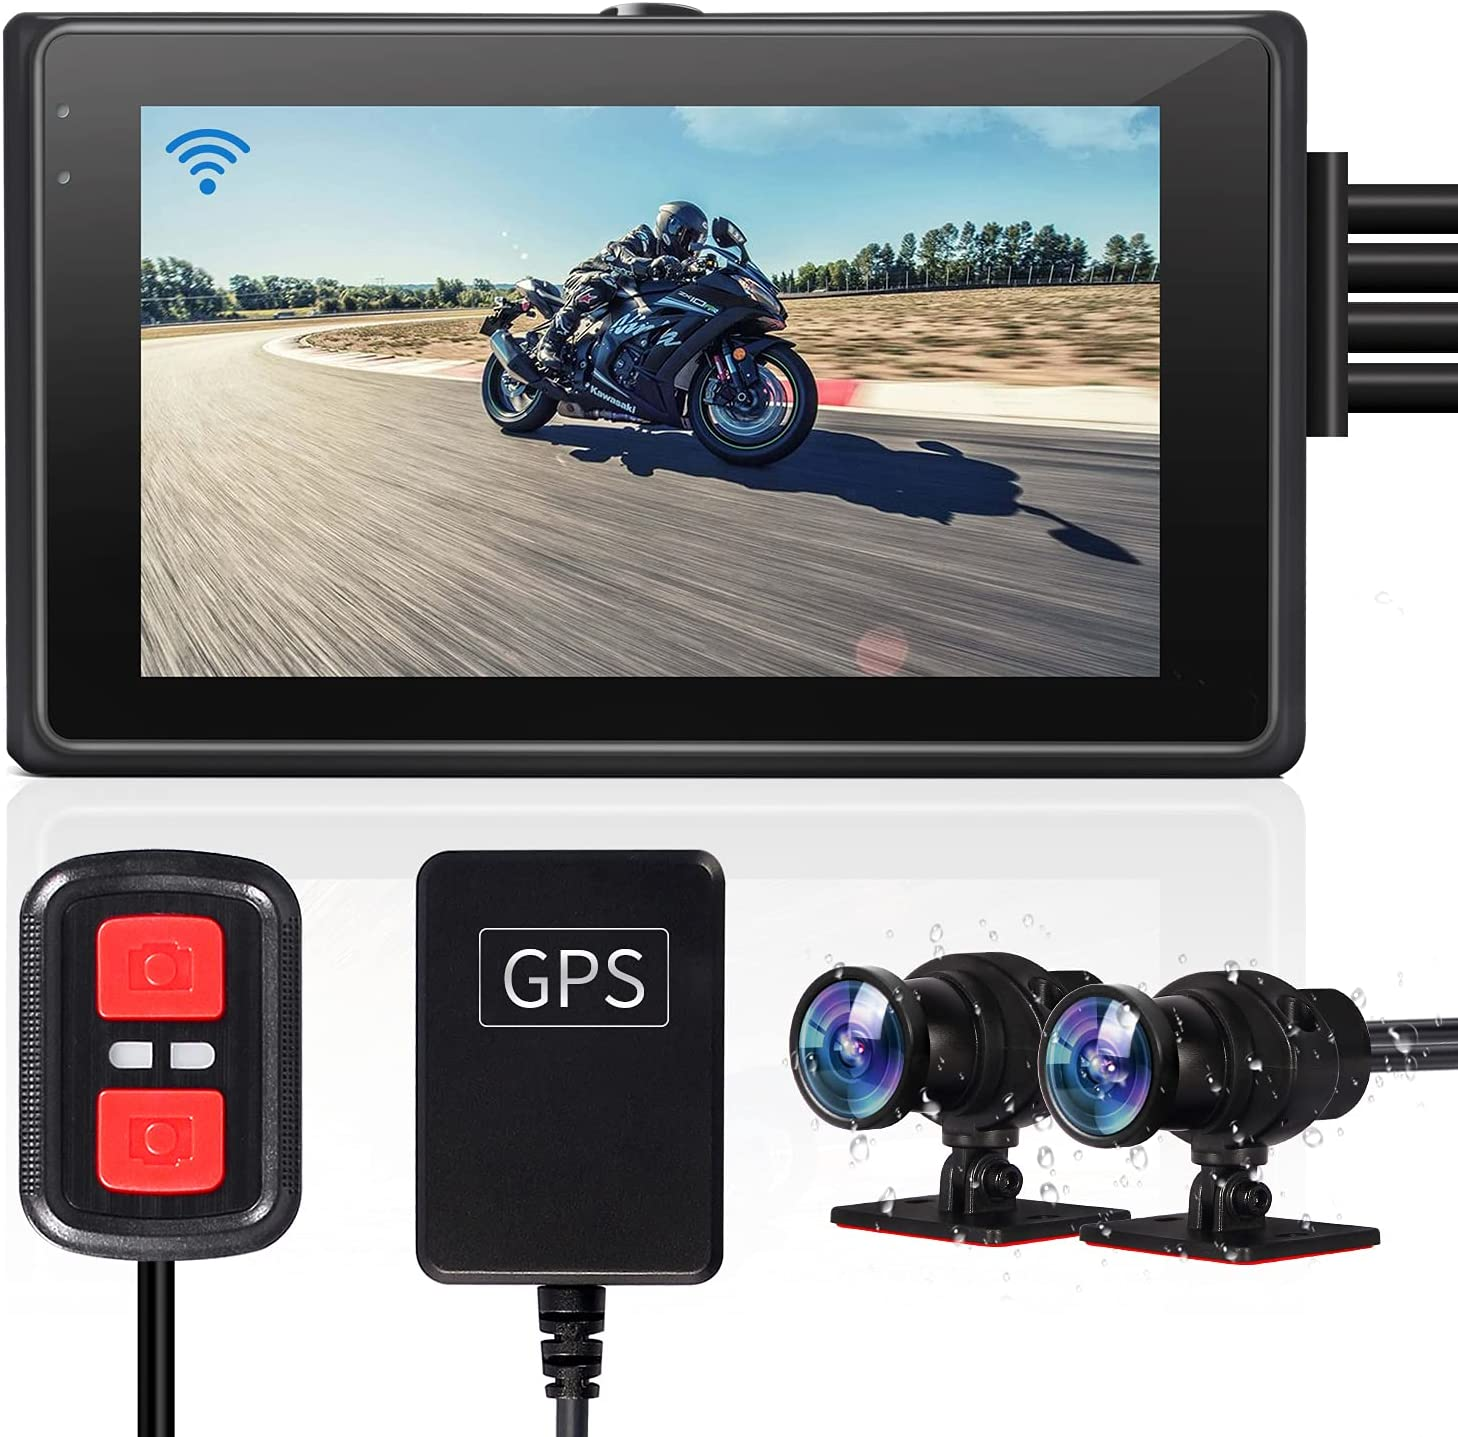 VSYSTO Bargain sale Fish Eye Camera Motorcycle Recording 2 cam Dash Chan Dual Luxury goods